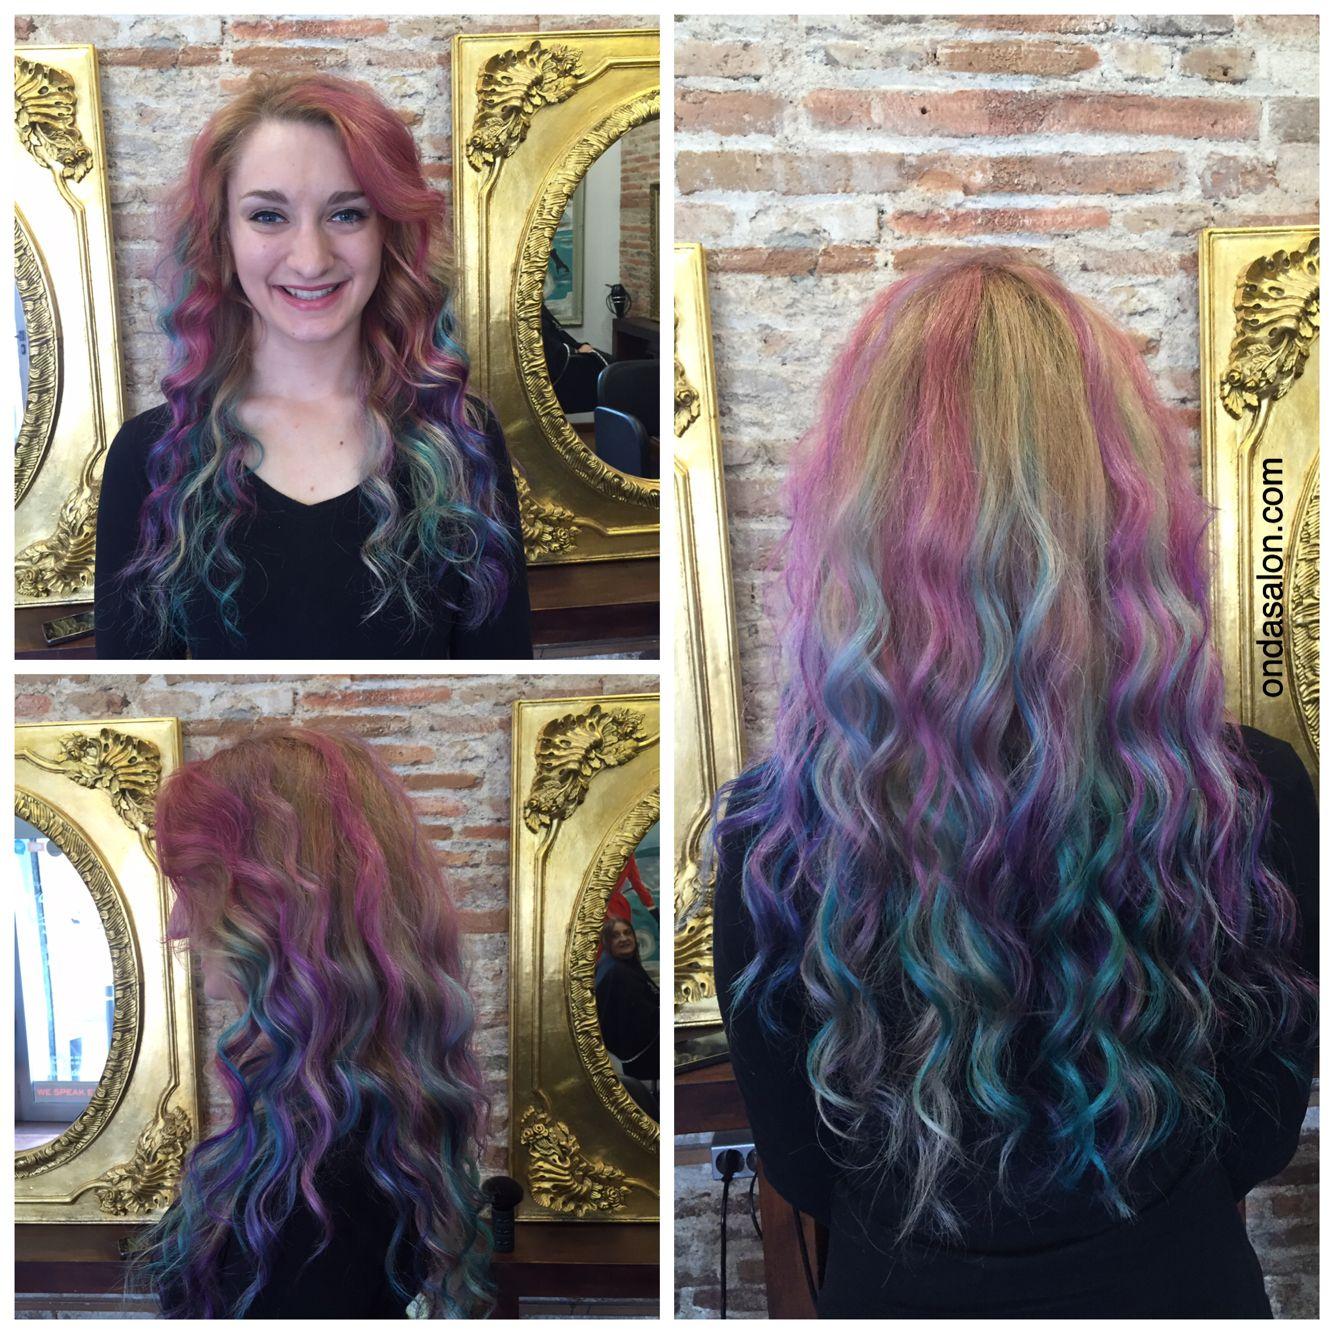 Color + corte + styling - Color + cut + styling by #OndaSalonTeam #OndaSalon #colordepelo #cortedepelo #cortedepelocorto #haircolor #unicornhair #haircut #shorthaircut #Barcelona #Barceloneta